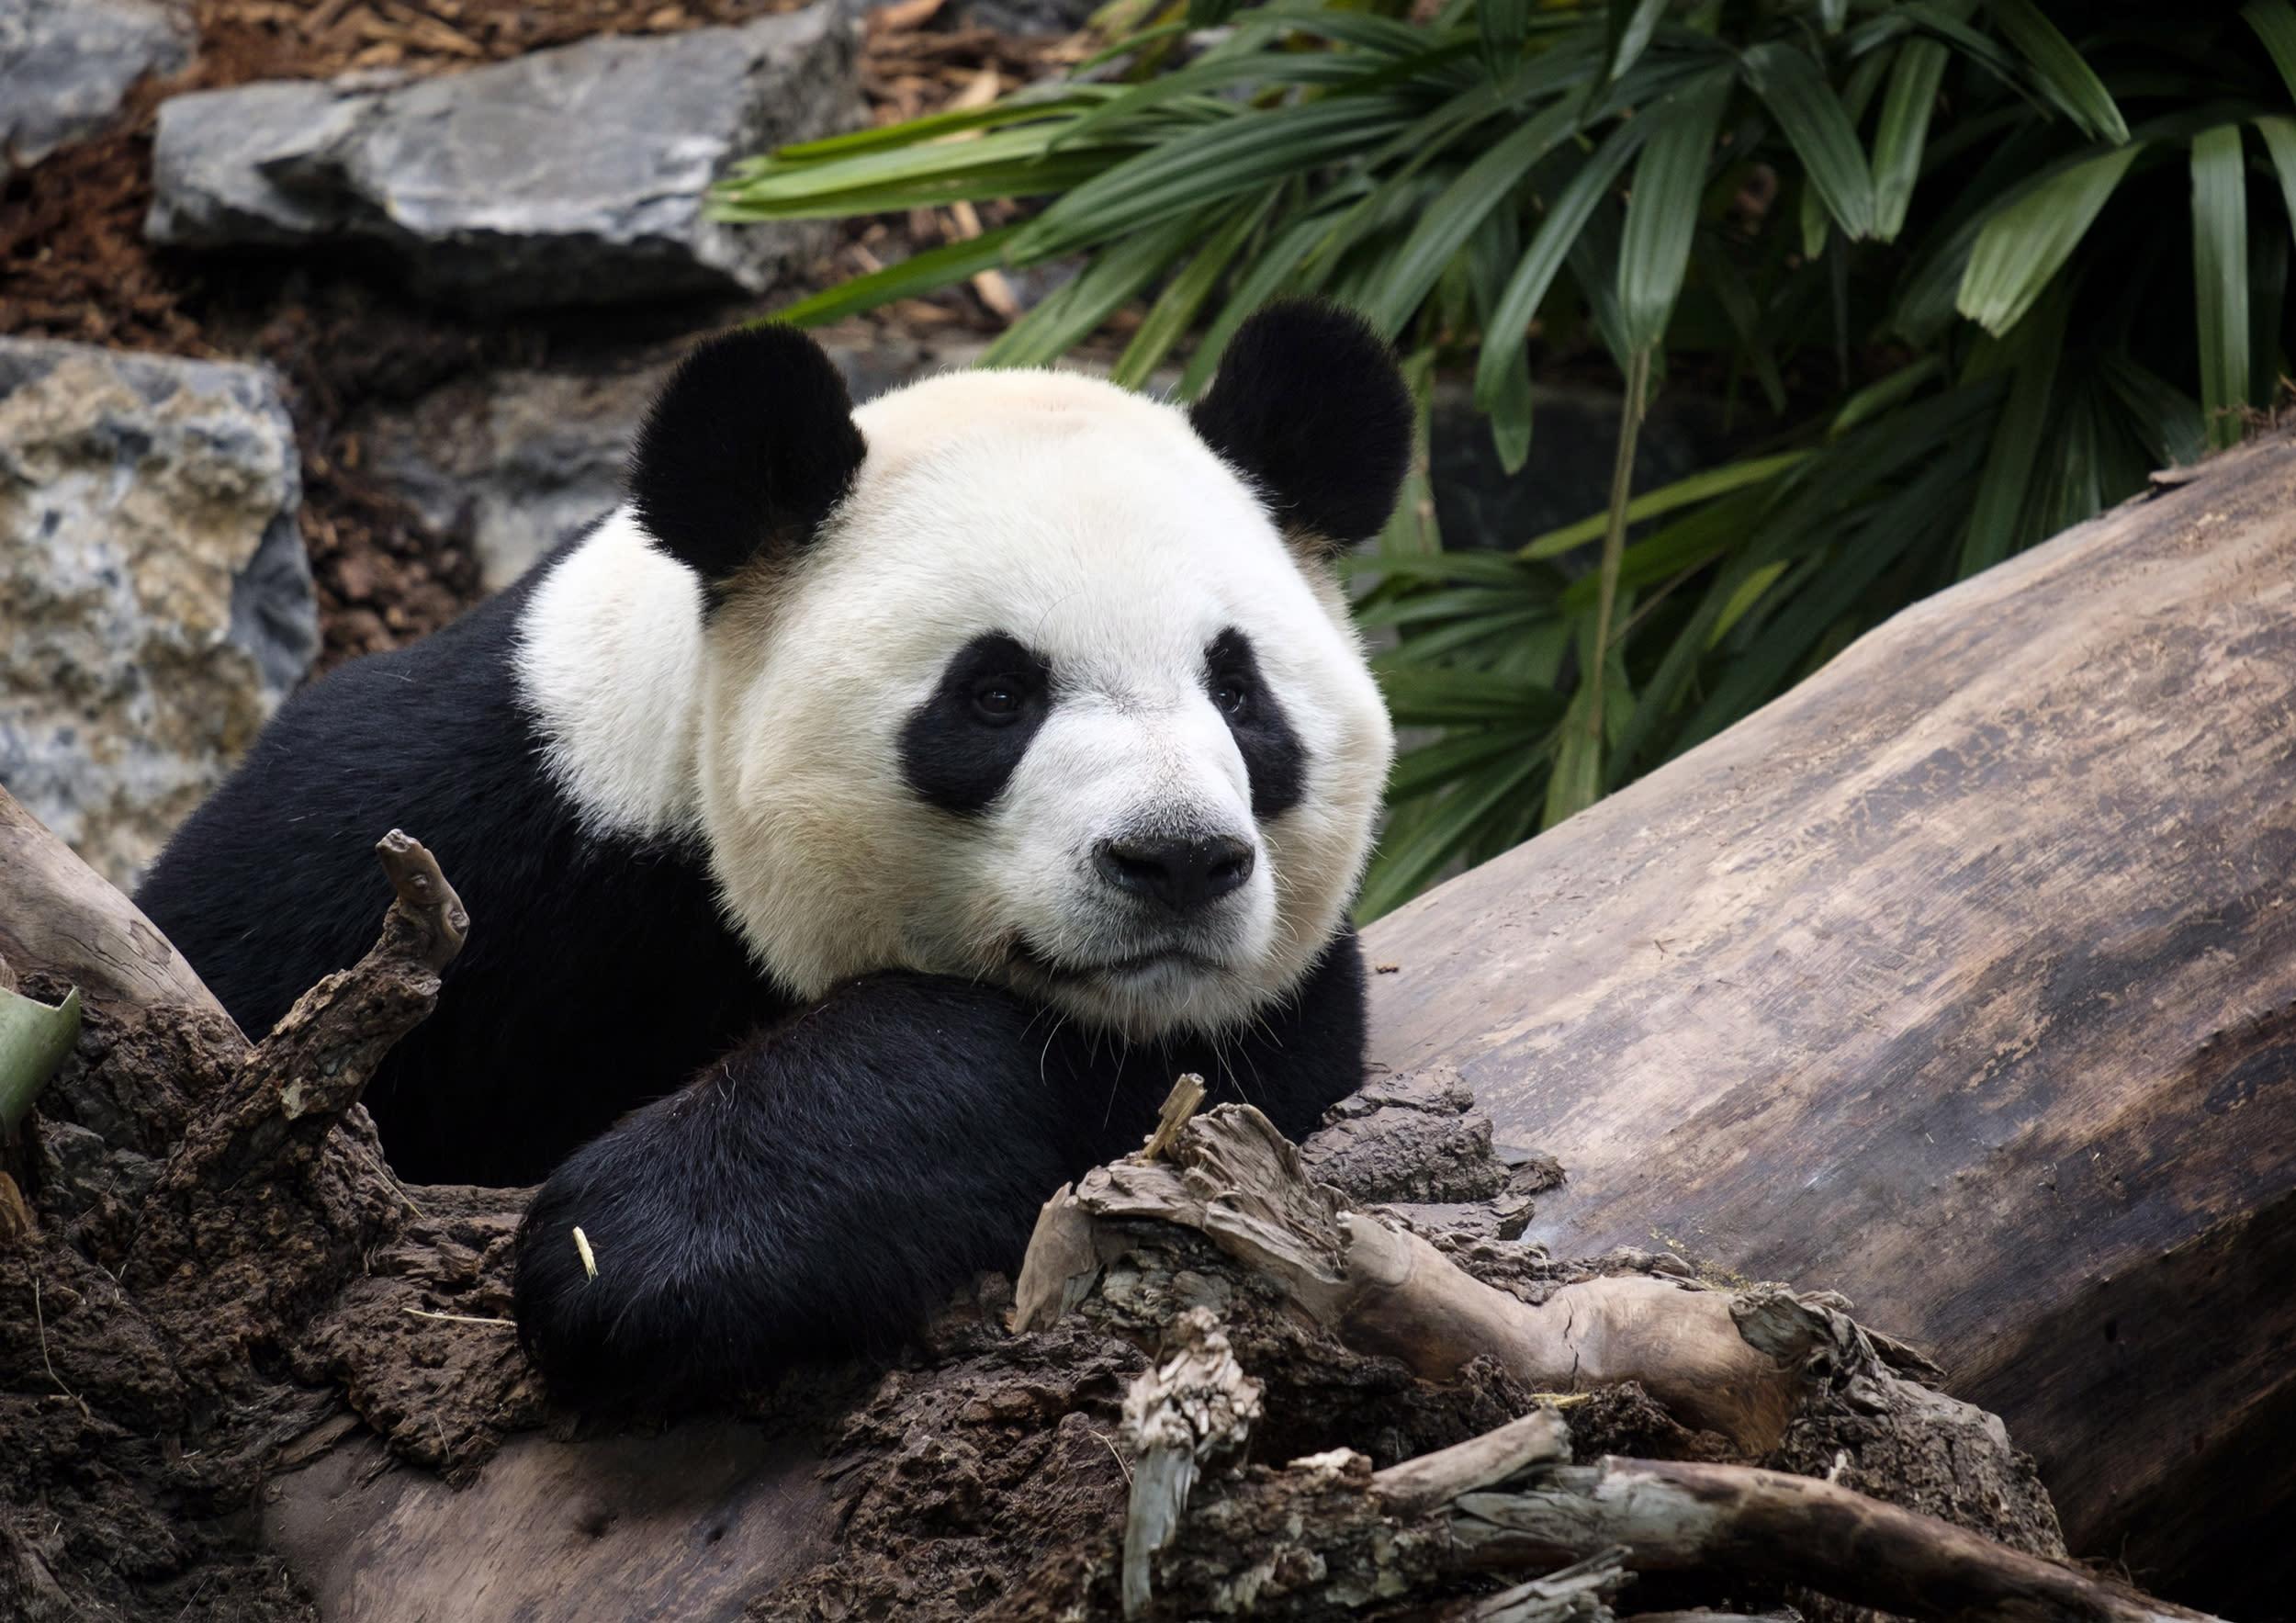 Zoo to return pandas to China because bamboo too hard to get